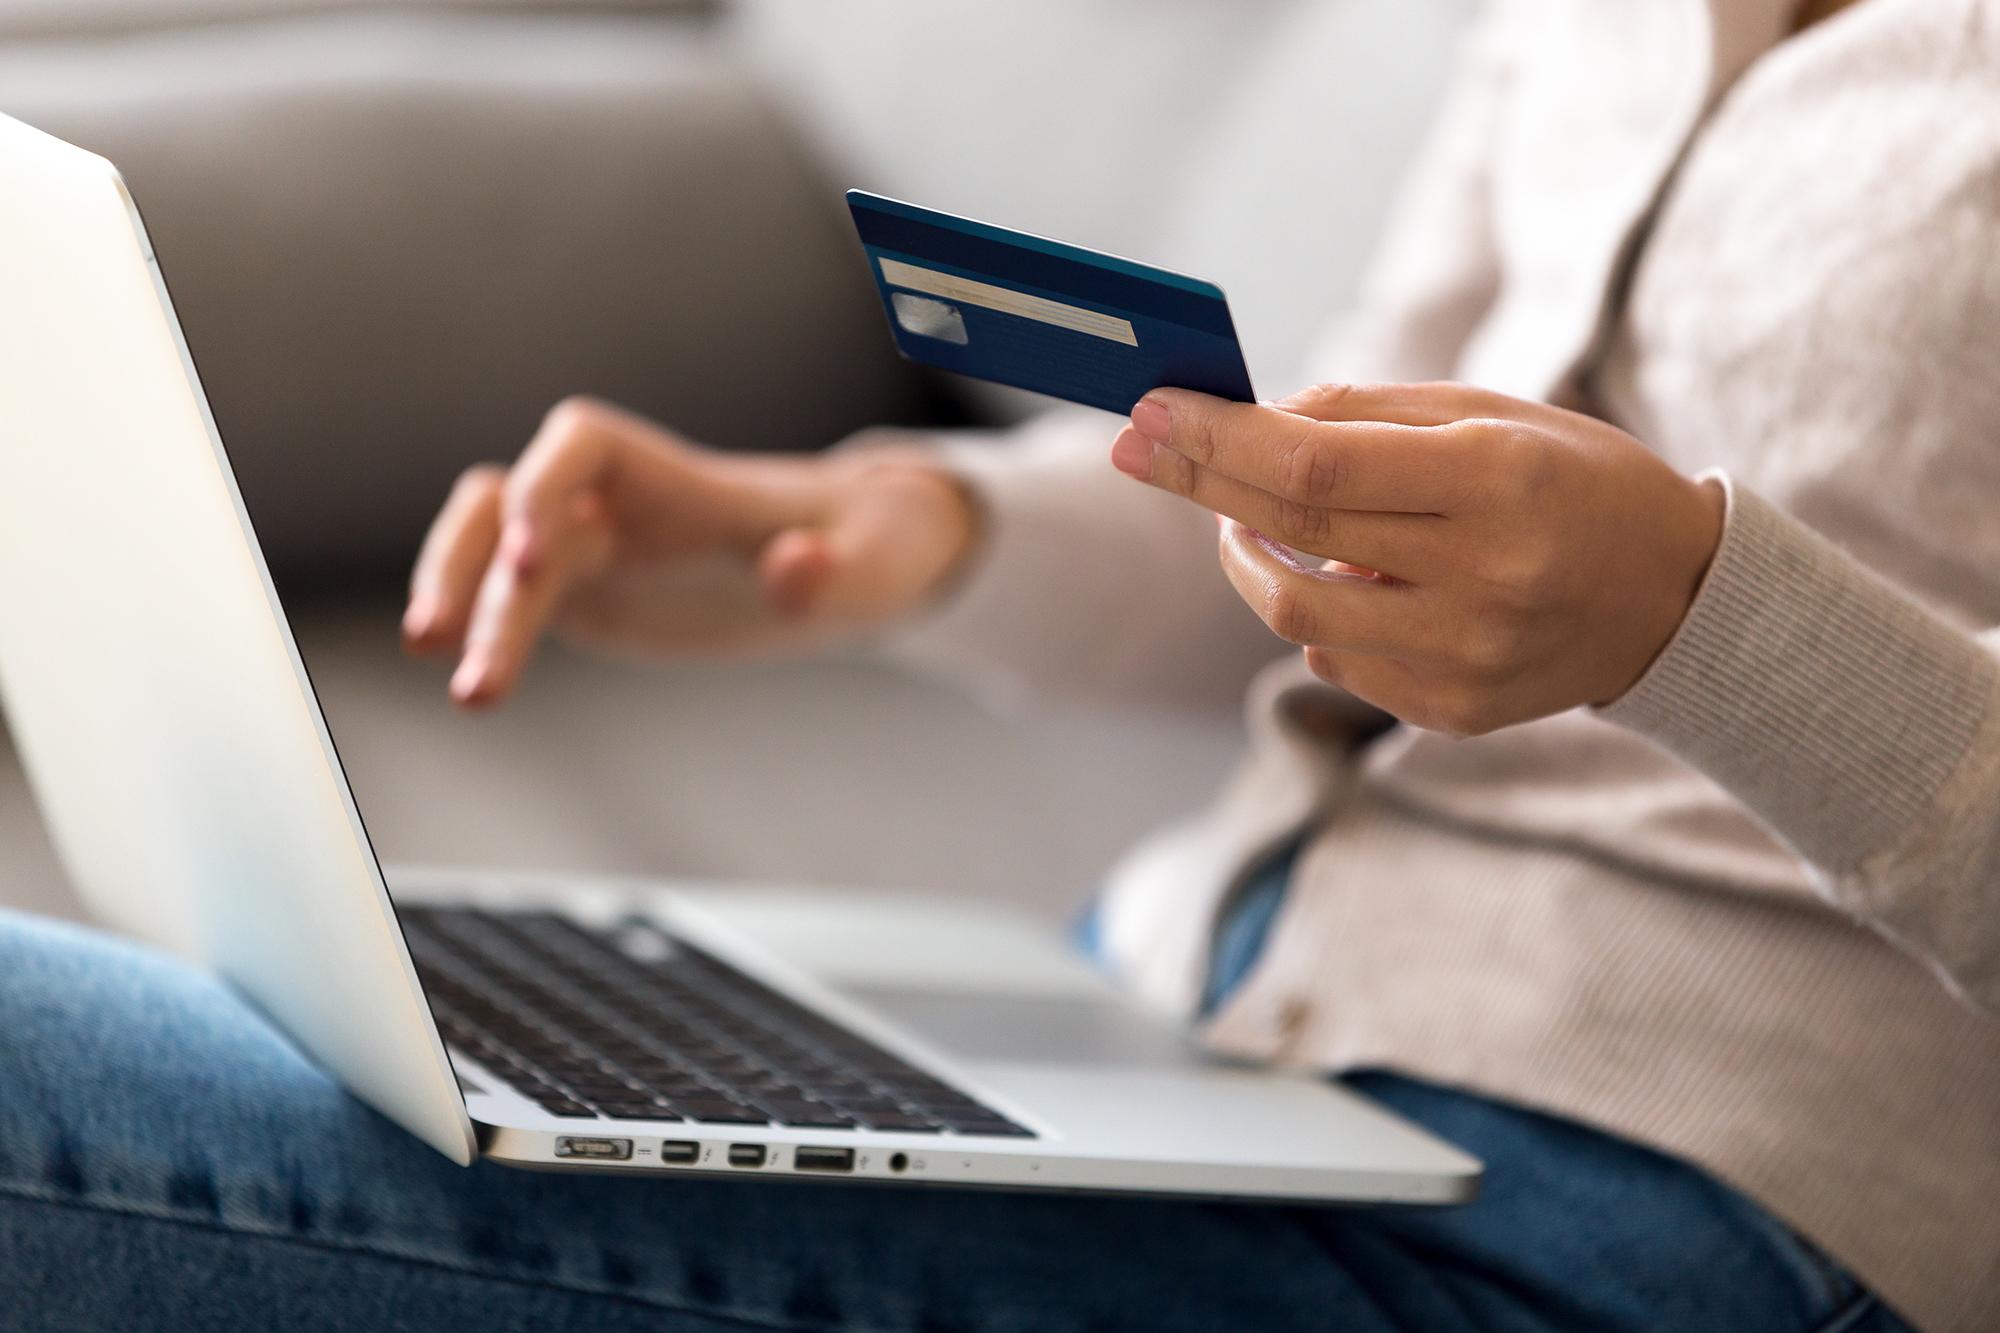 Woman using bank card. (Image: Shutterstock)